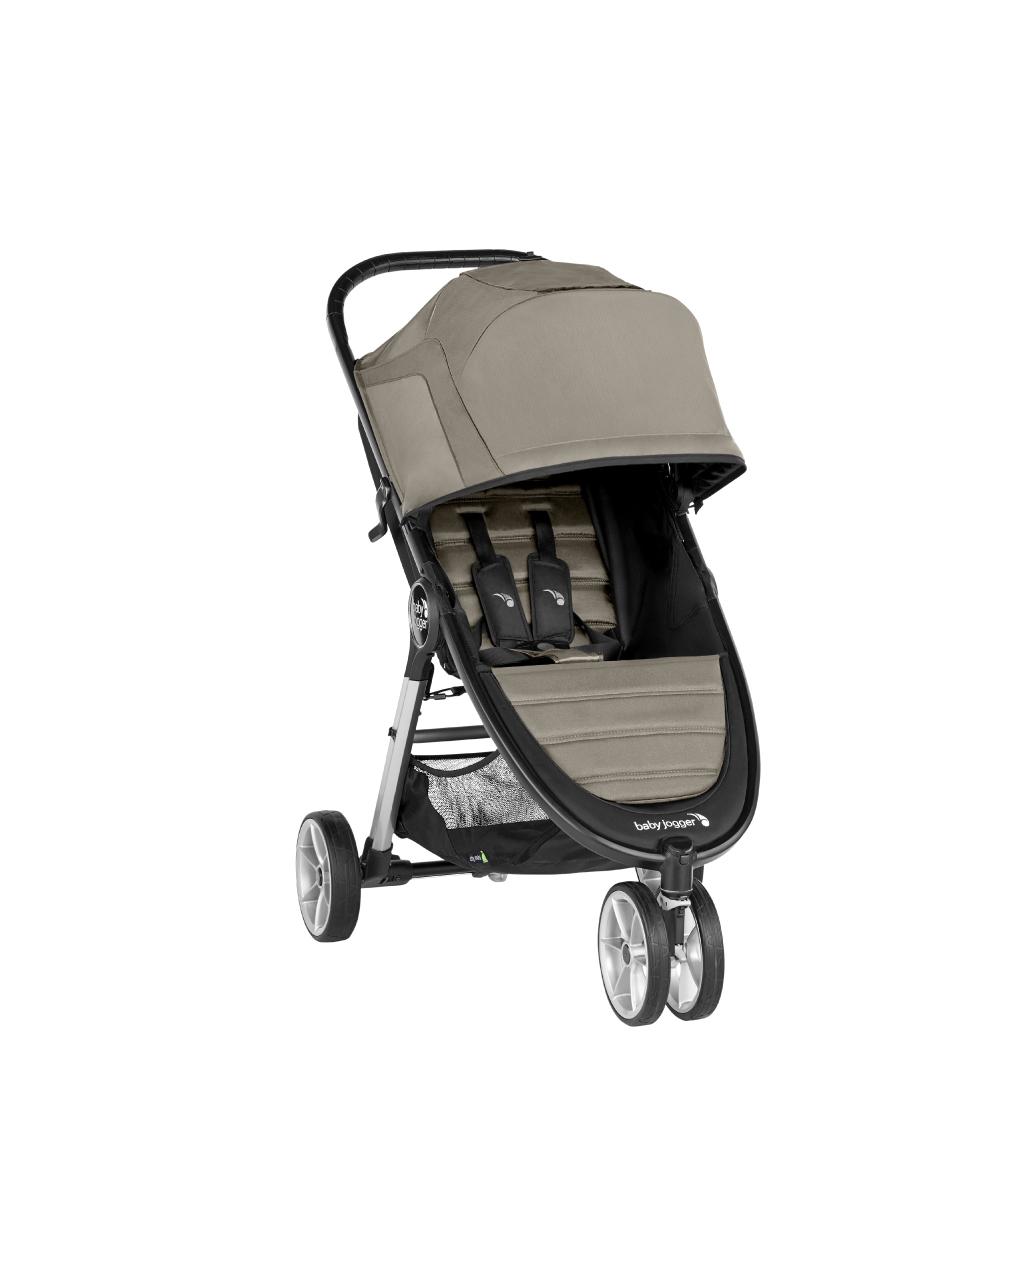 City mini2 3 ruote - sepia - Baby Jogger